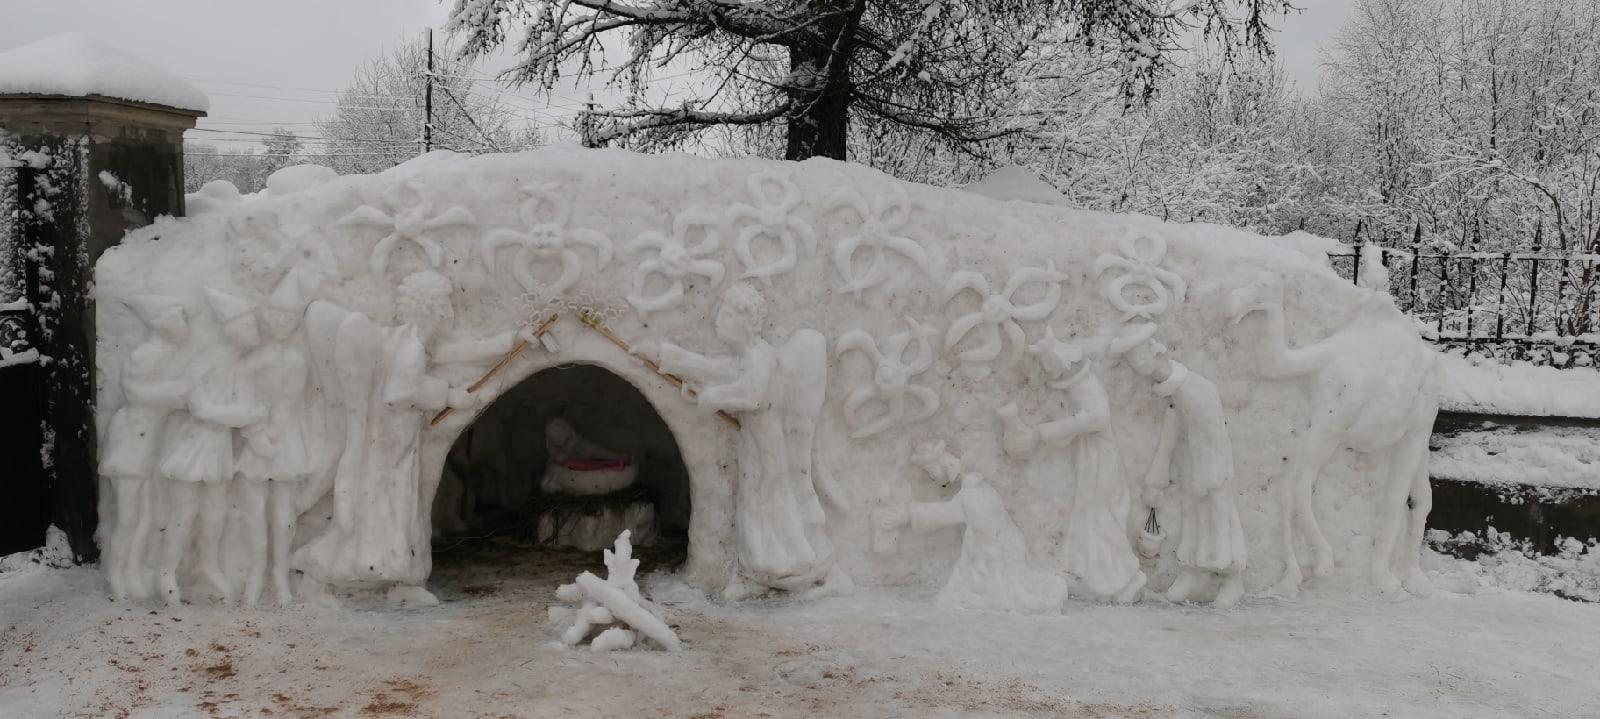 На окраине Твери сделали потрясающий вертеп из снега